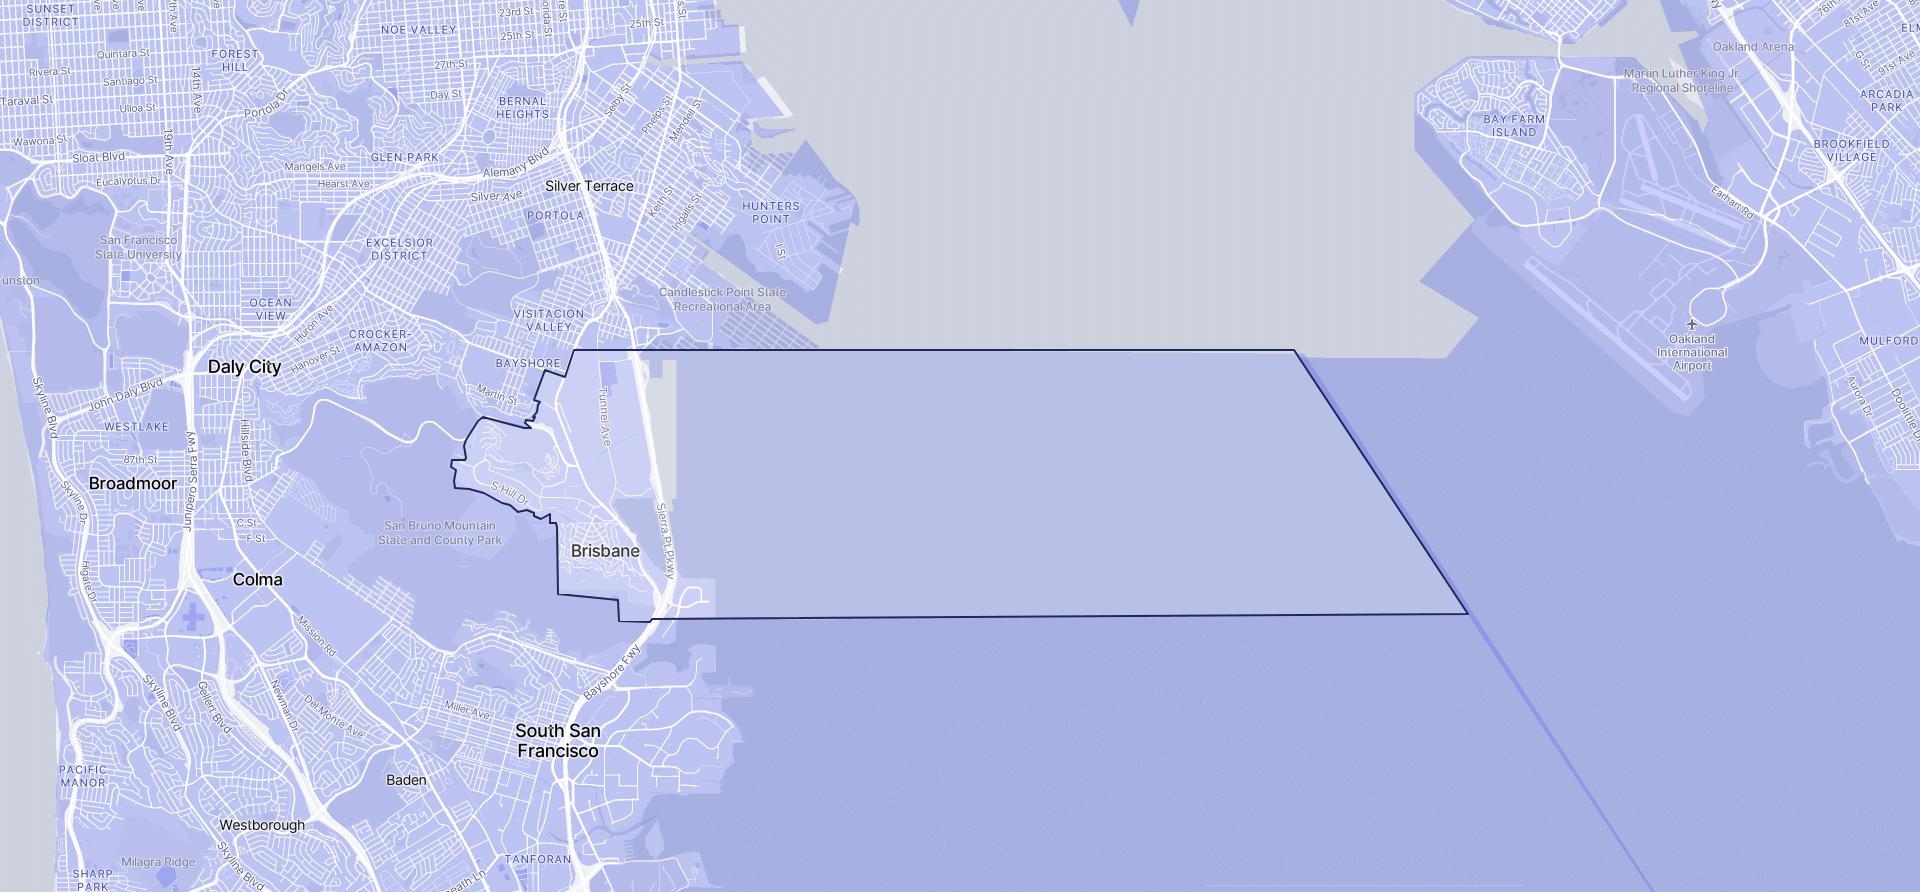 Image of Brisbane boundaries on a map.